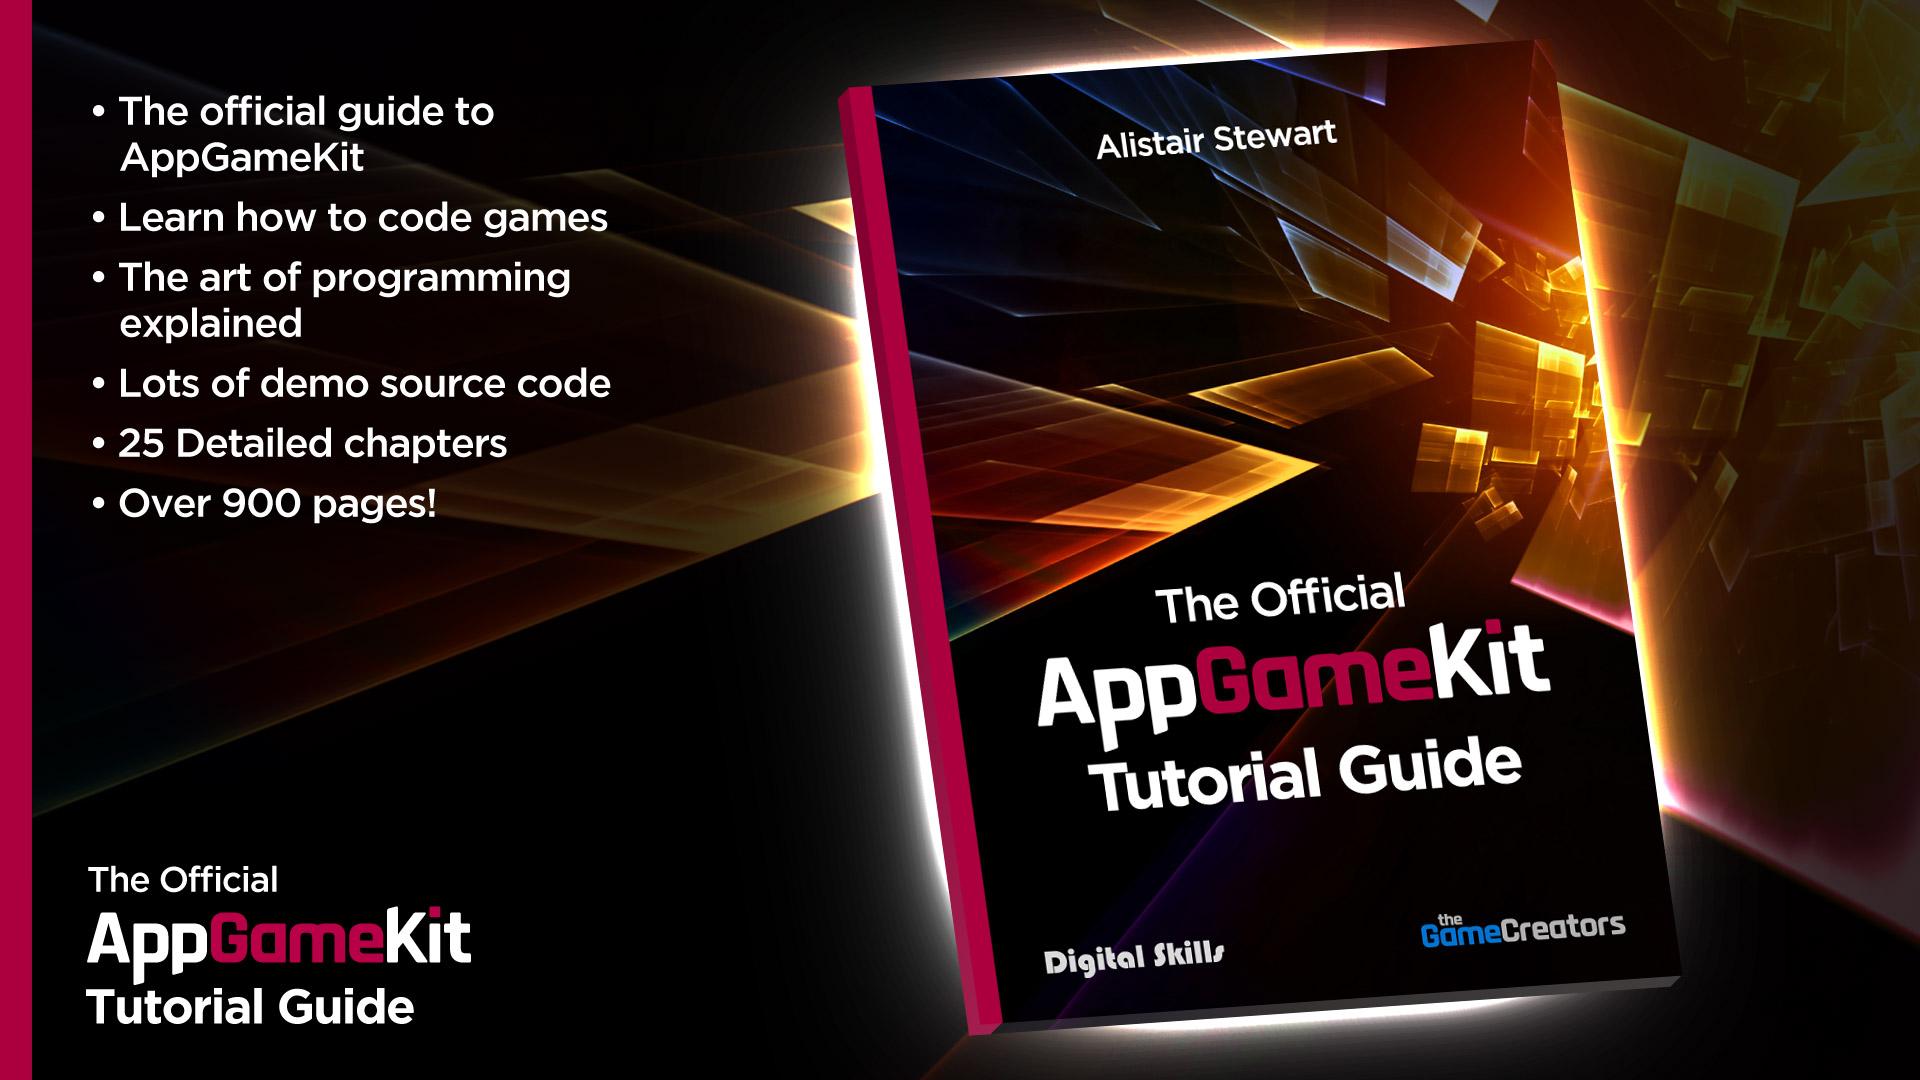 AppGameKit - The Official AppGameKit Tutorial Guide